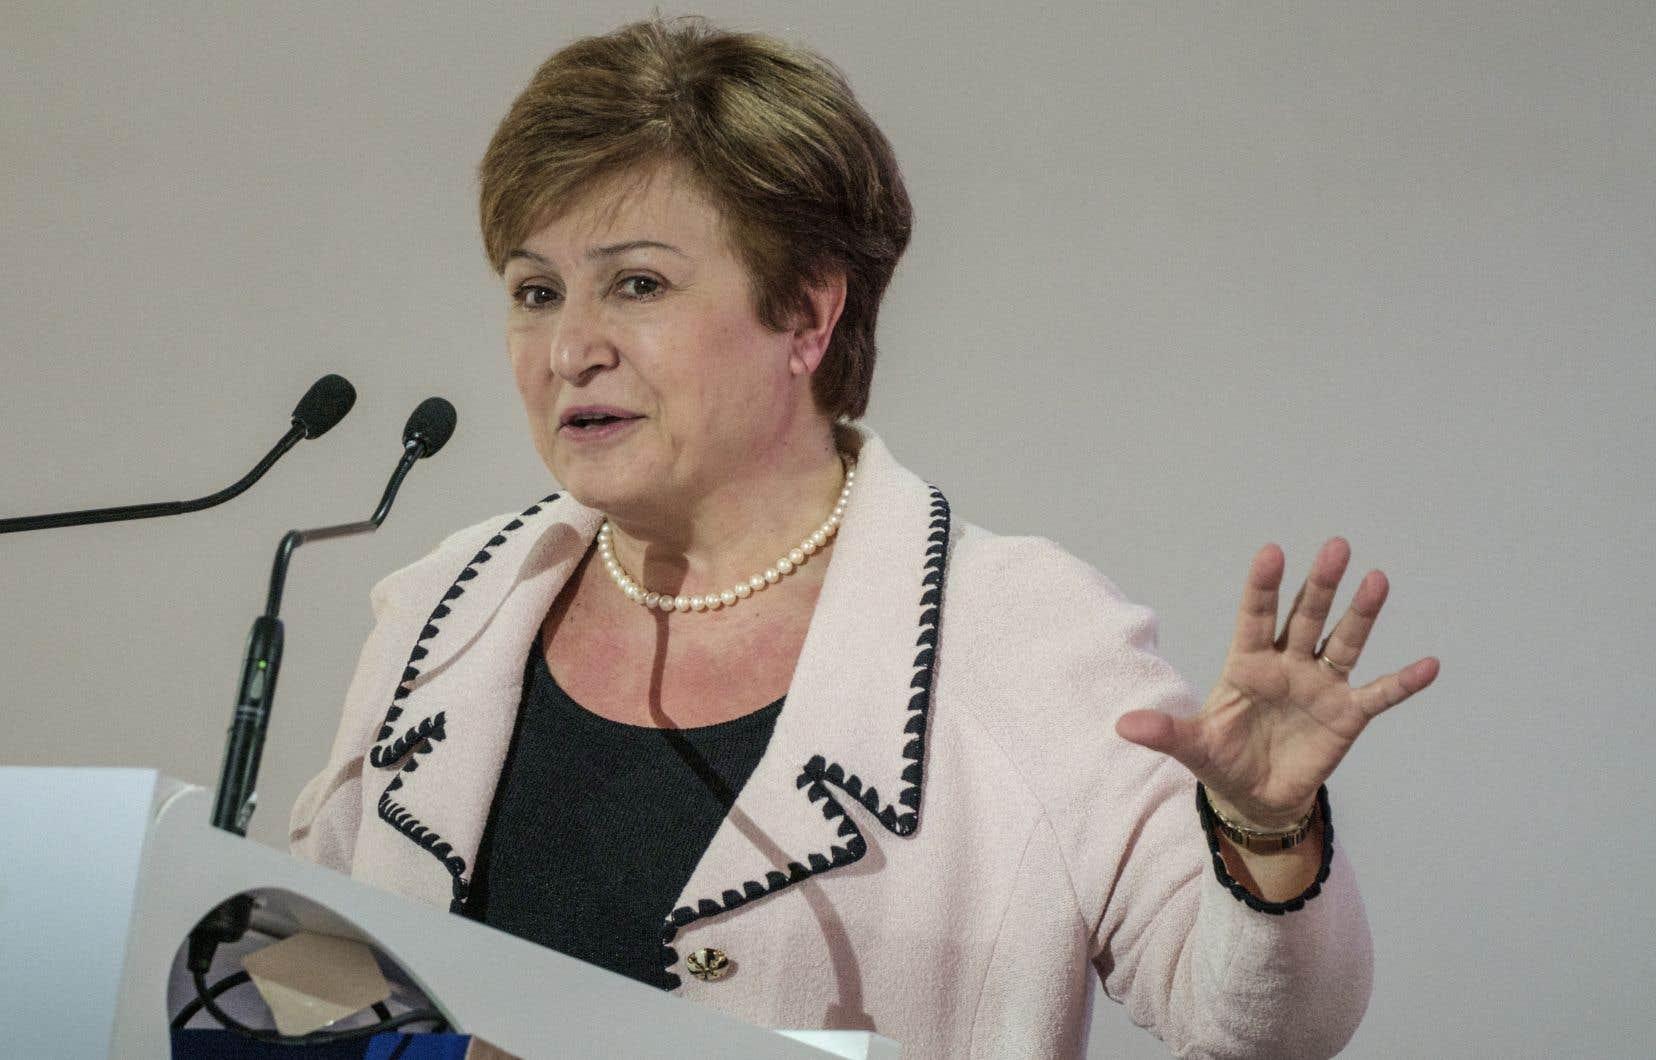 La Bulgare Kristalina Georgieva, actuelle numéro2 de la Banque mondiale